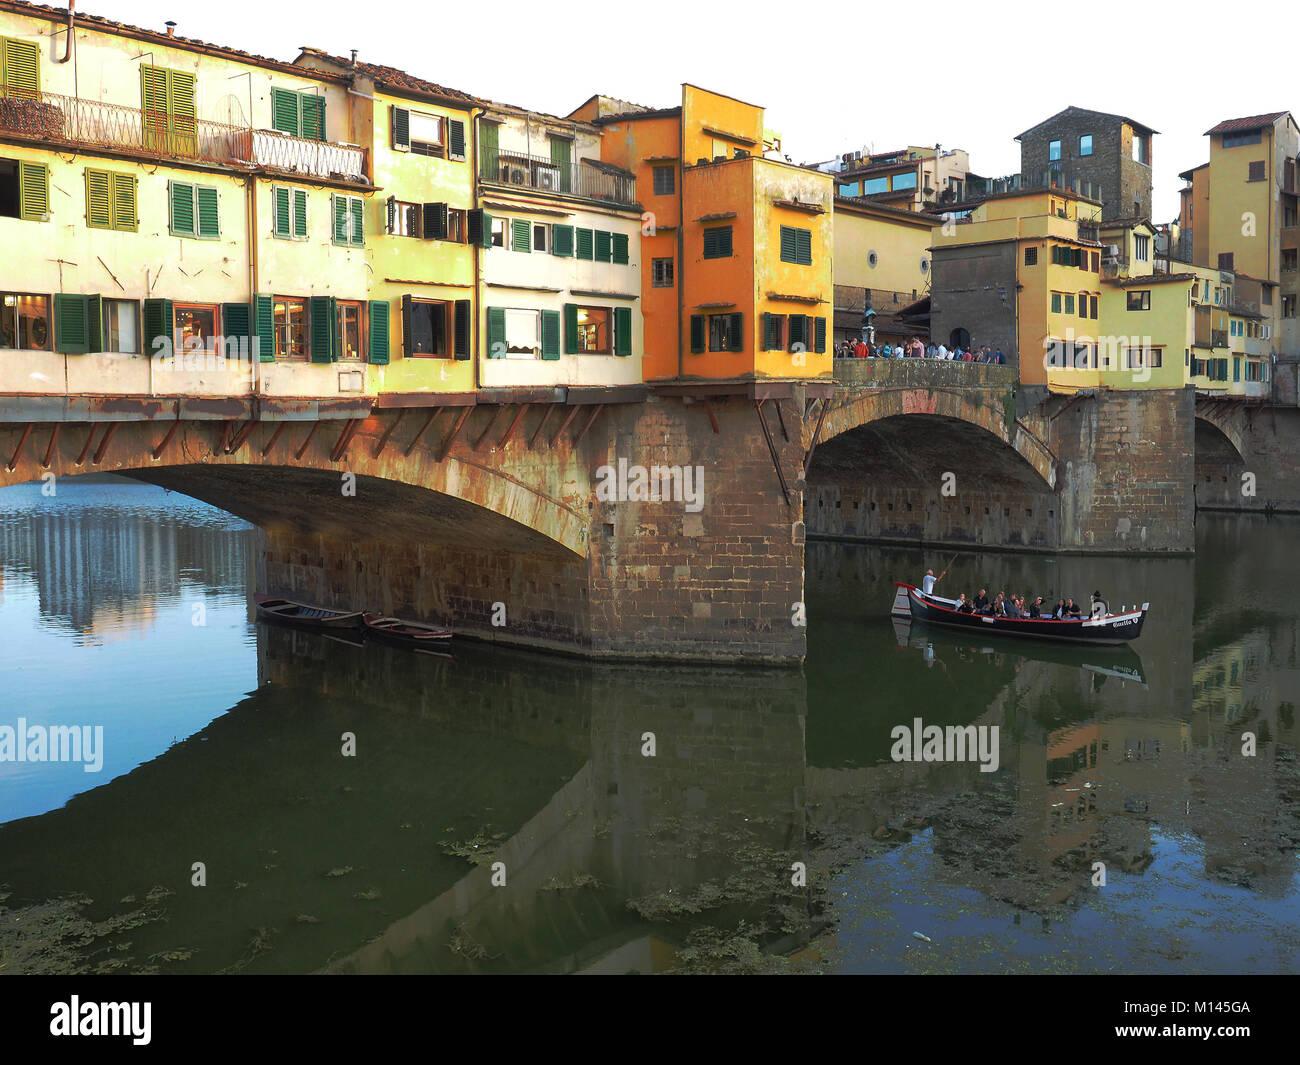 Tourist Gondola in Arno River Ponte vecchioEurope,Italy,Tuscany,Florence, - Stock Image